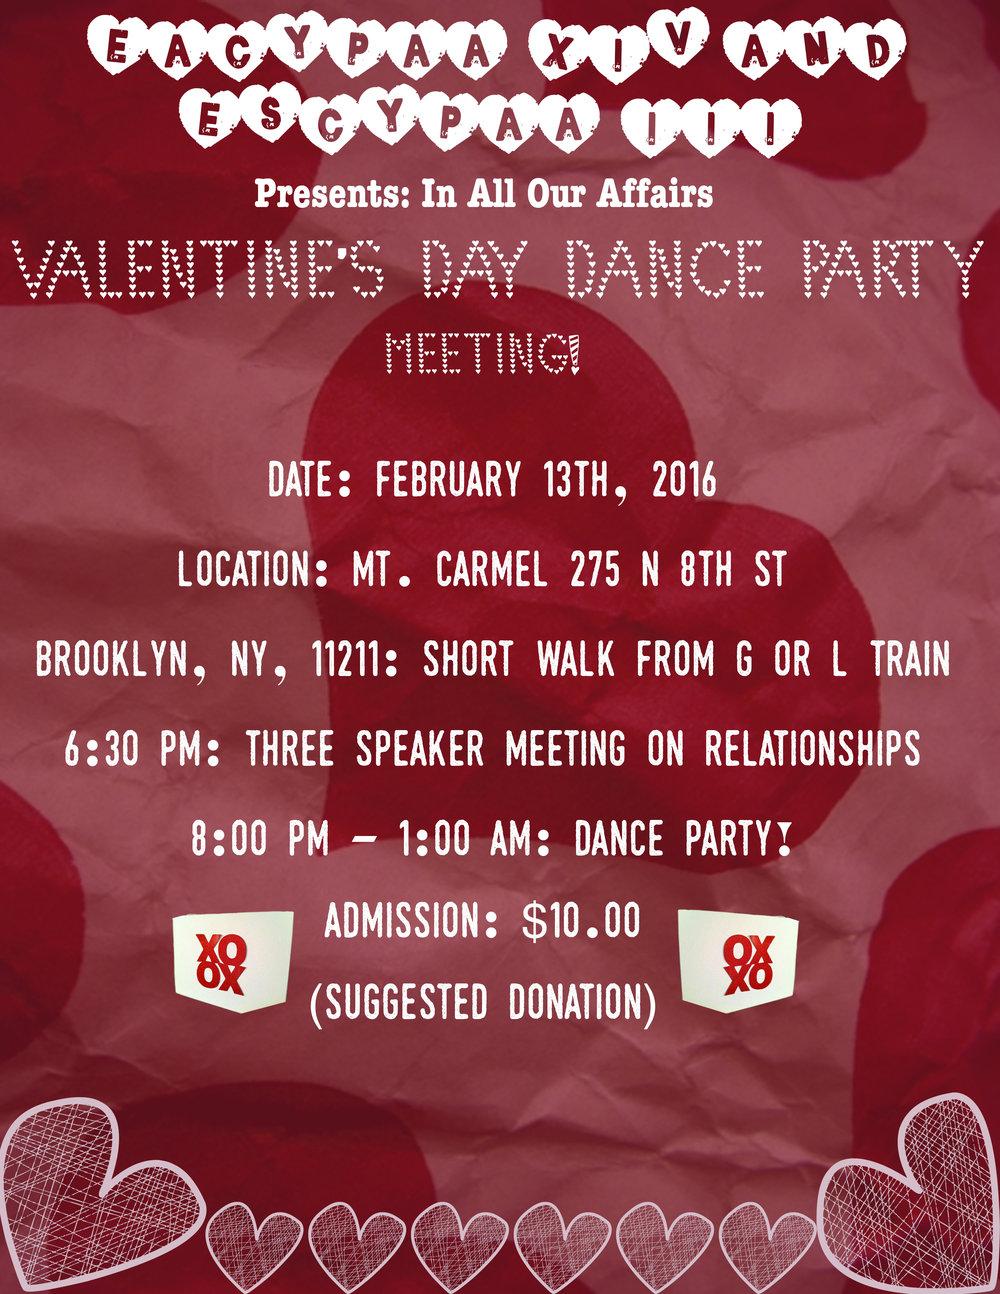 EACYPAA Valentine's Dance revised 2.jpg